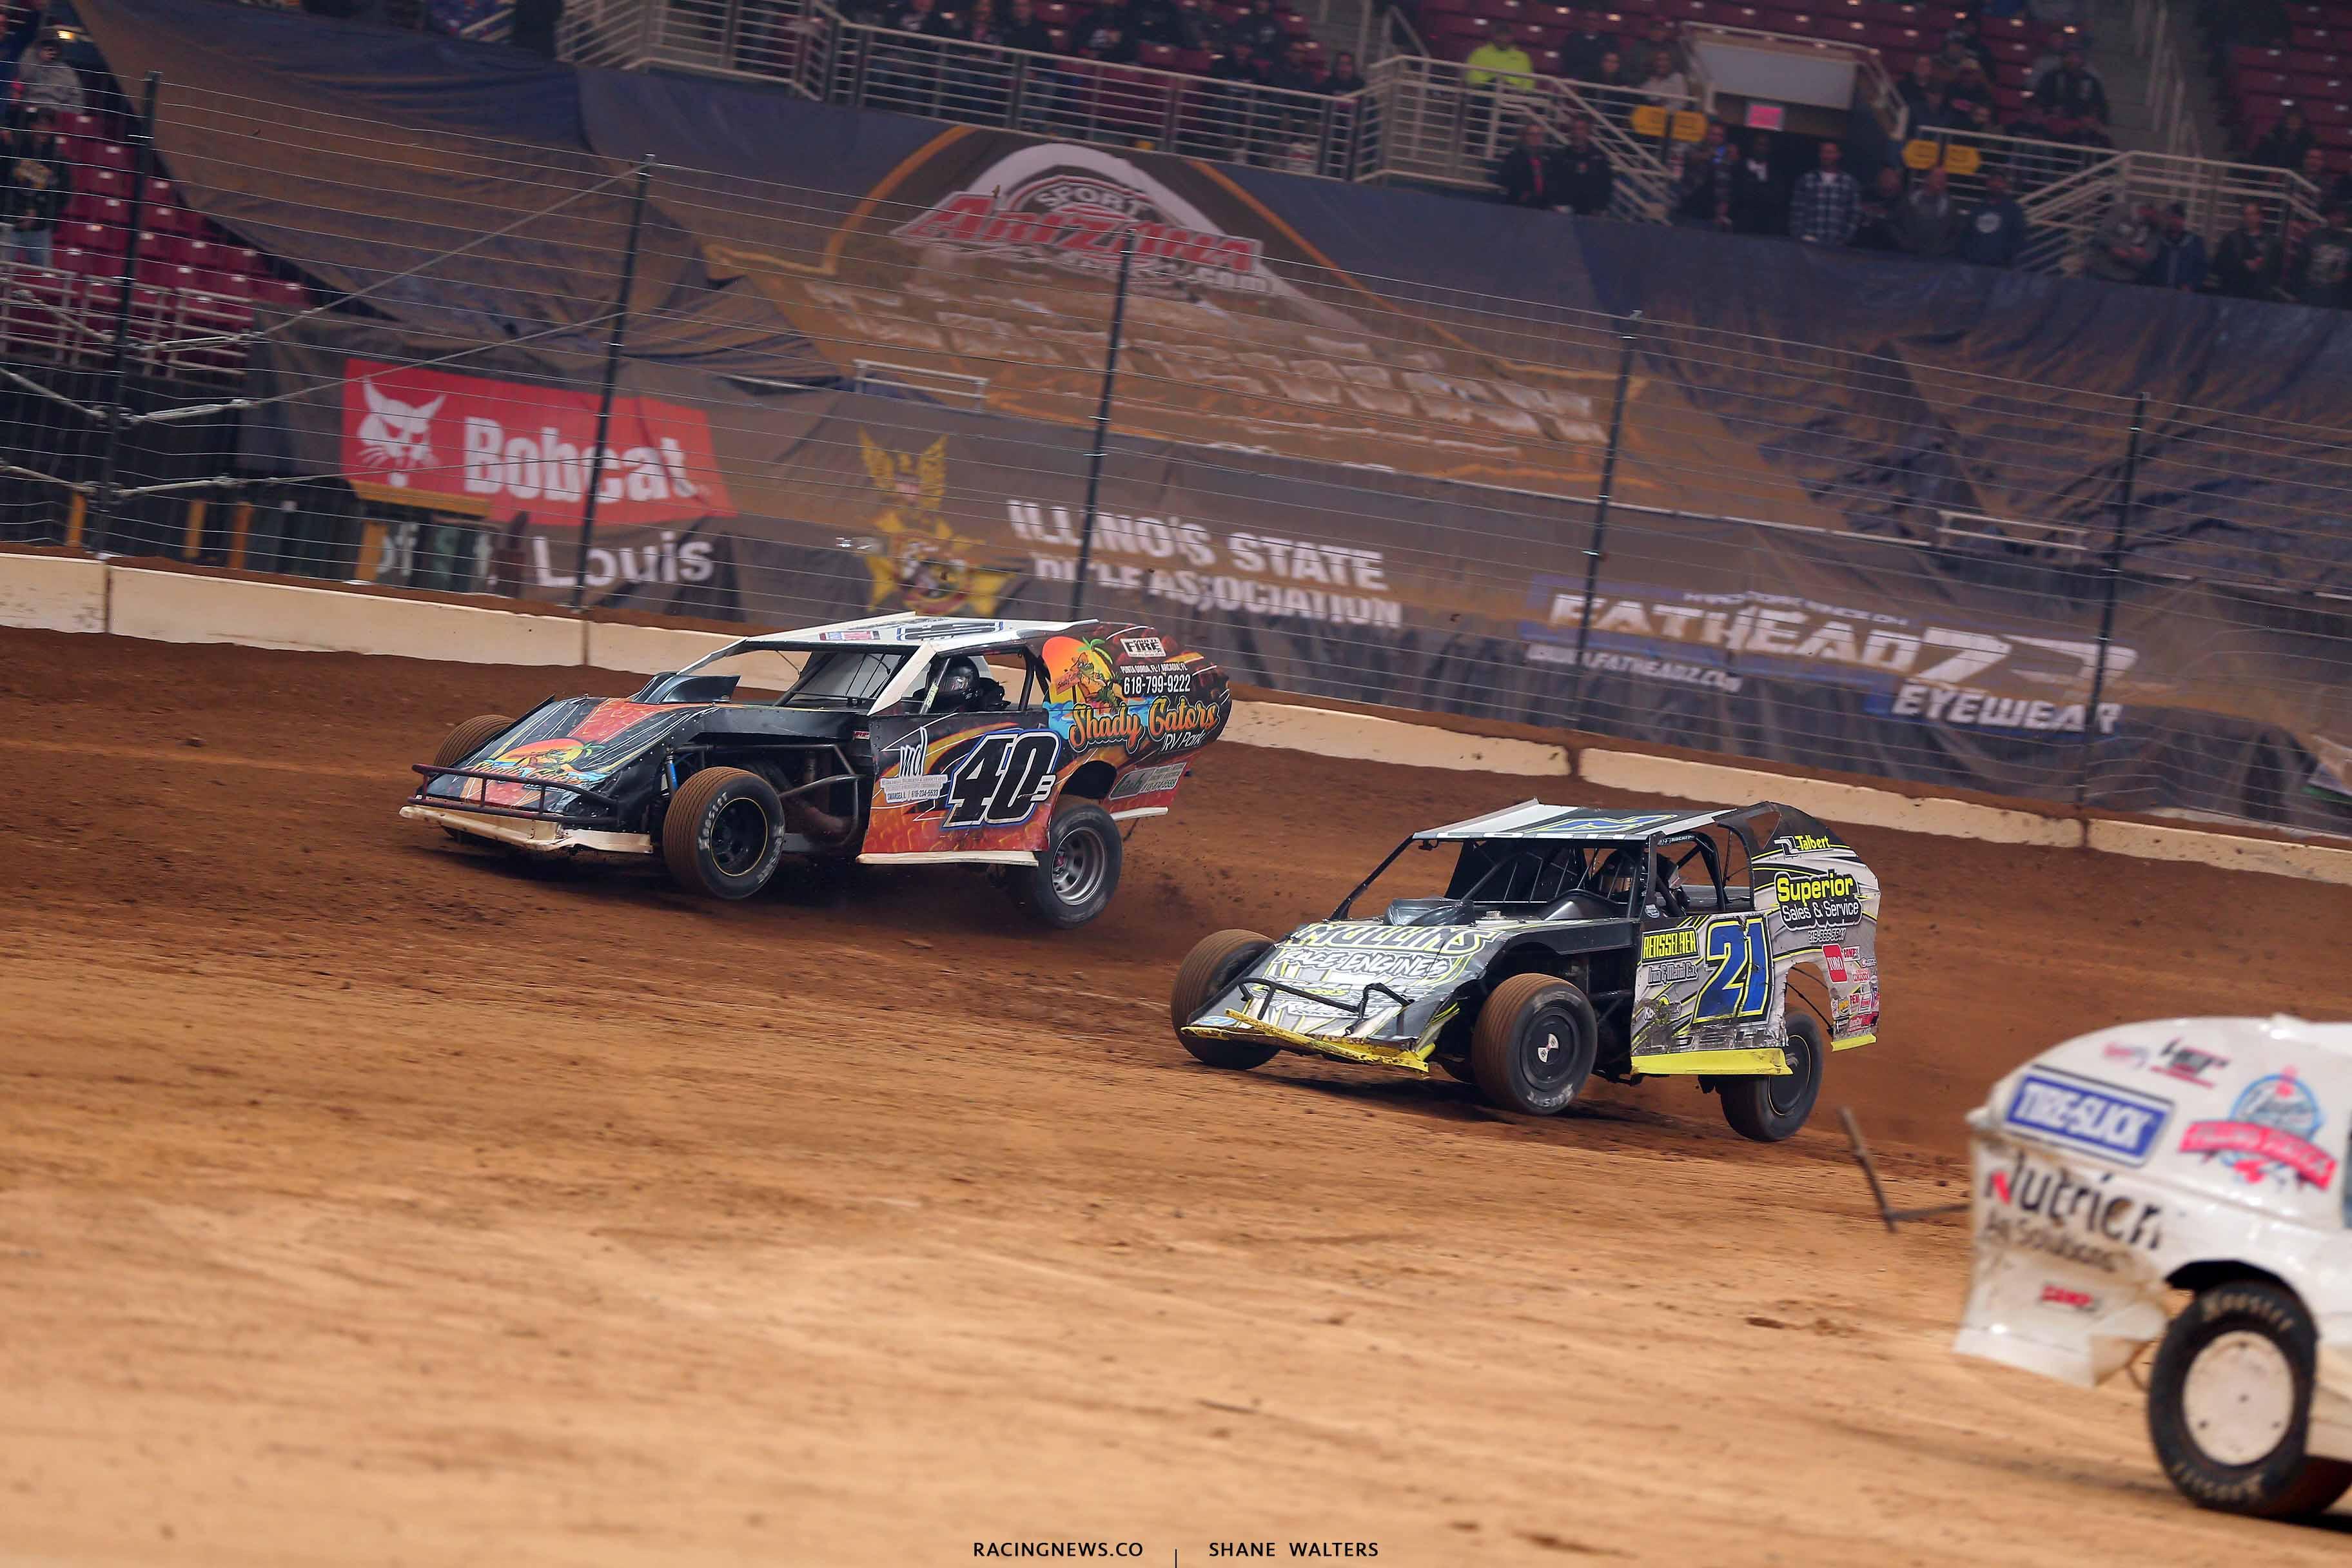 Kyle Bronson and Derek Losh in the Gateway Dirt Nationals - Dirt Modifieds 2952